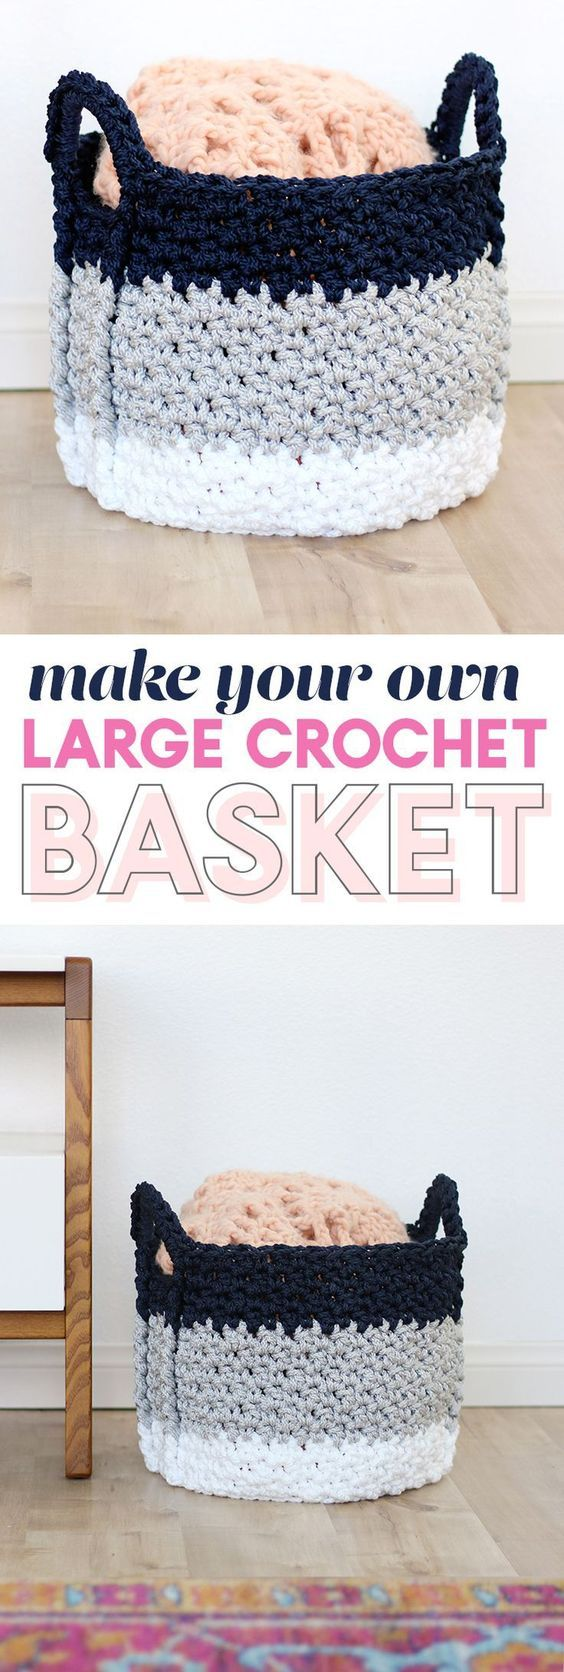 Large Crochet Basket with Handles - Free Crochet Pattern   Cestos ...